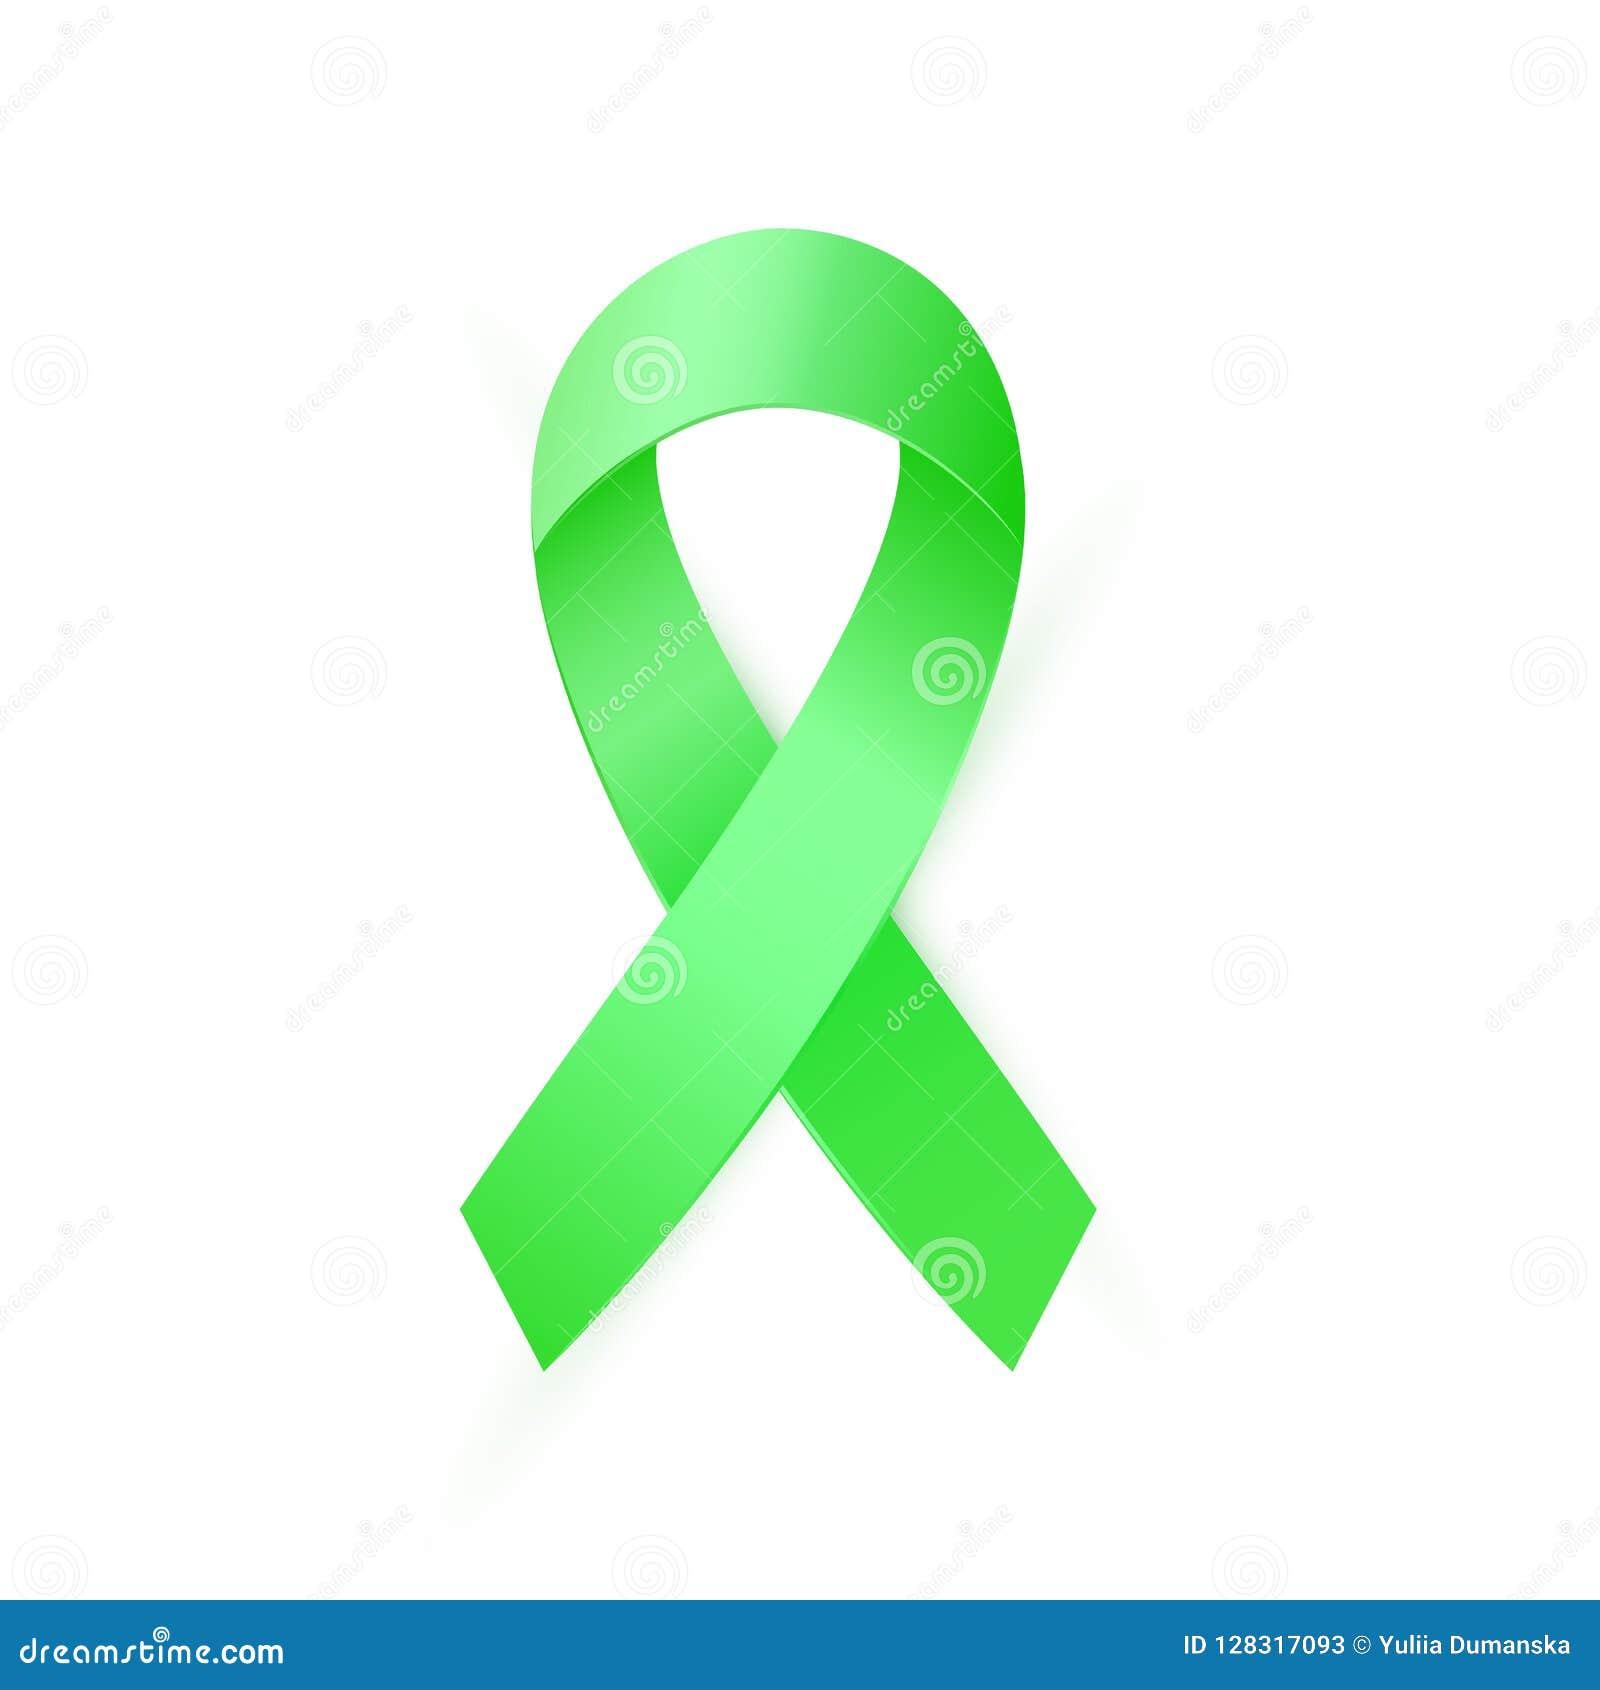 Green Awareness Ribbon For Organ Transplant And Donation Scoliosis Mental Health Symbol